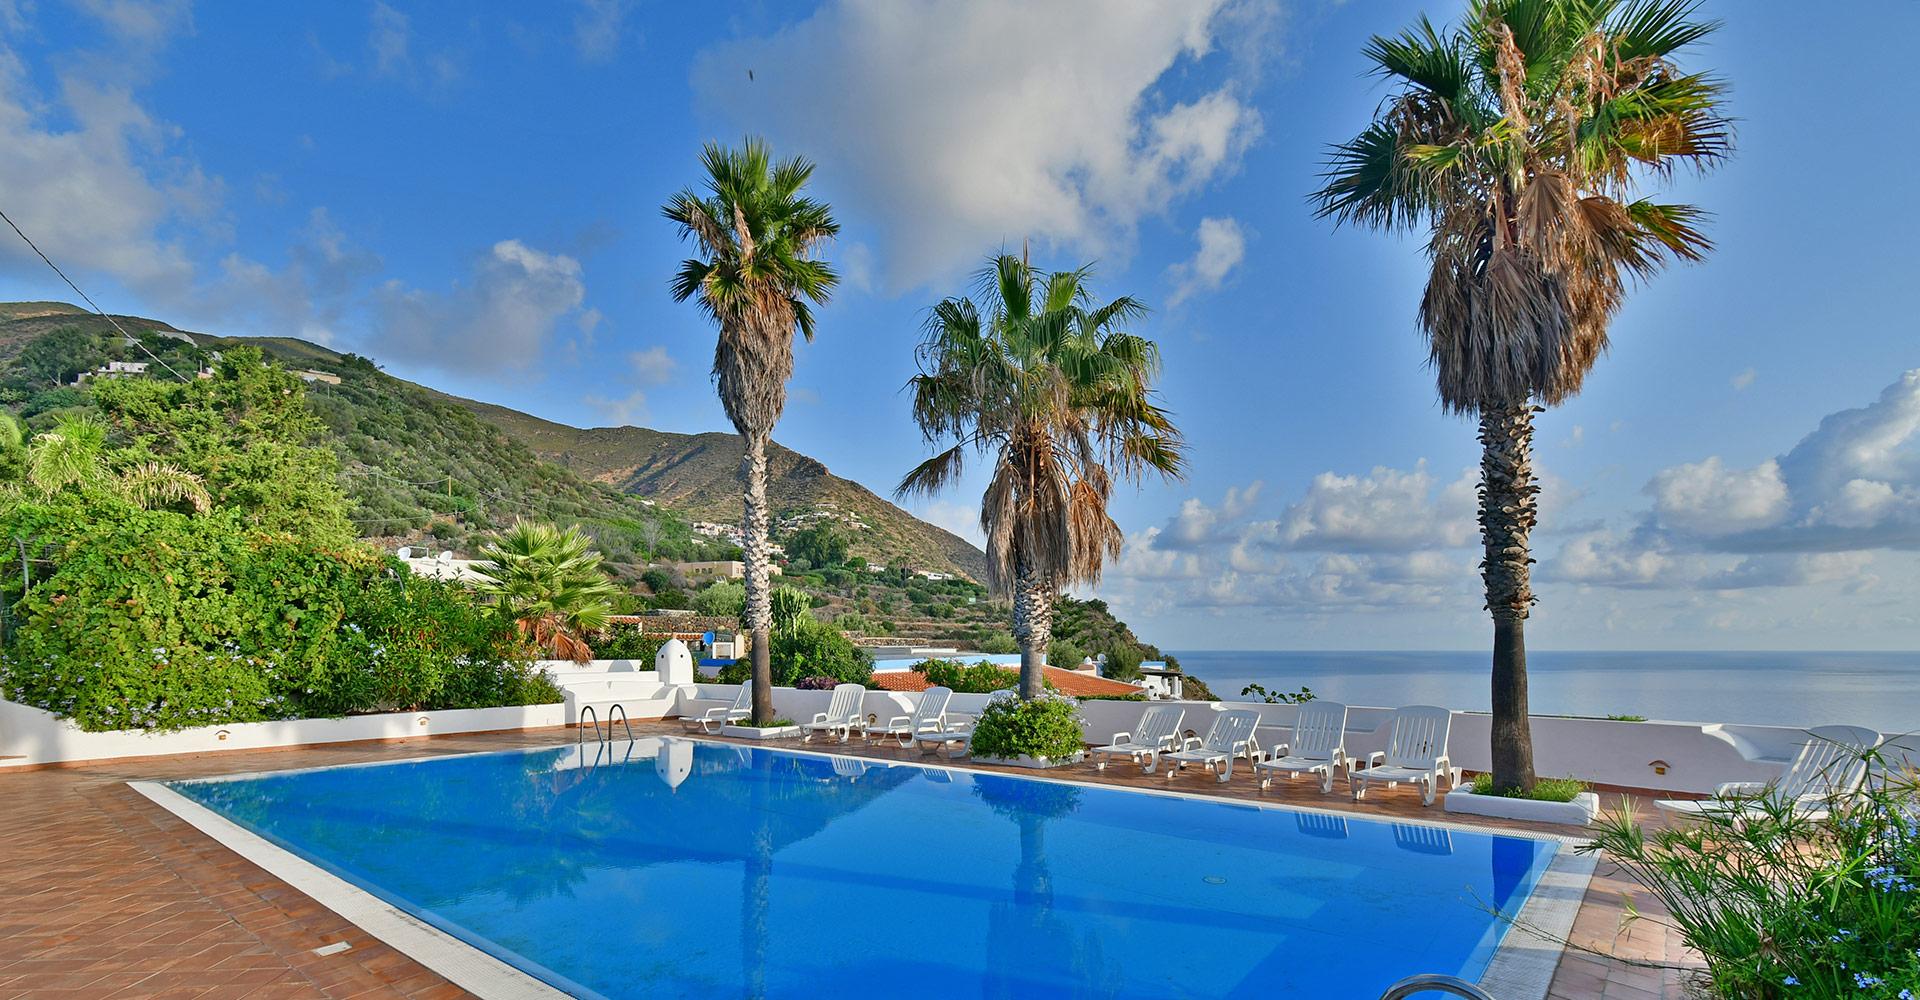 Hotel piscina Filicudi